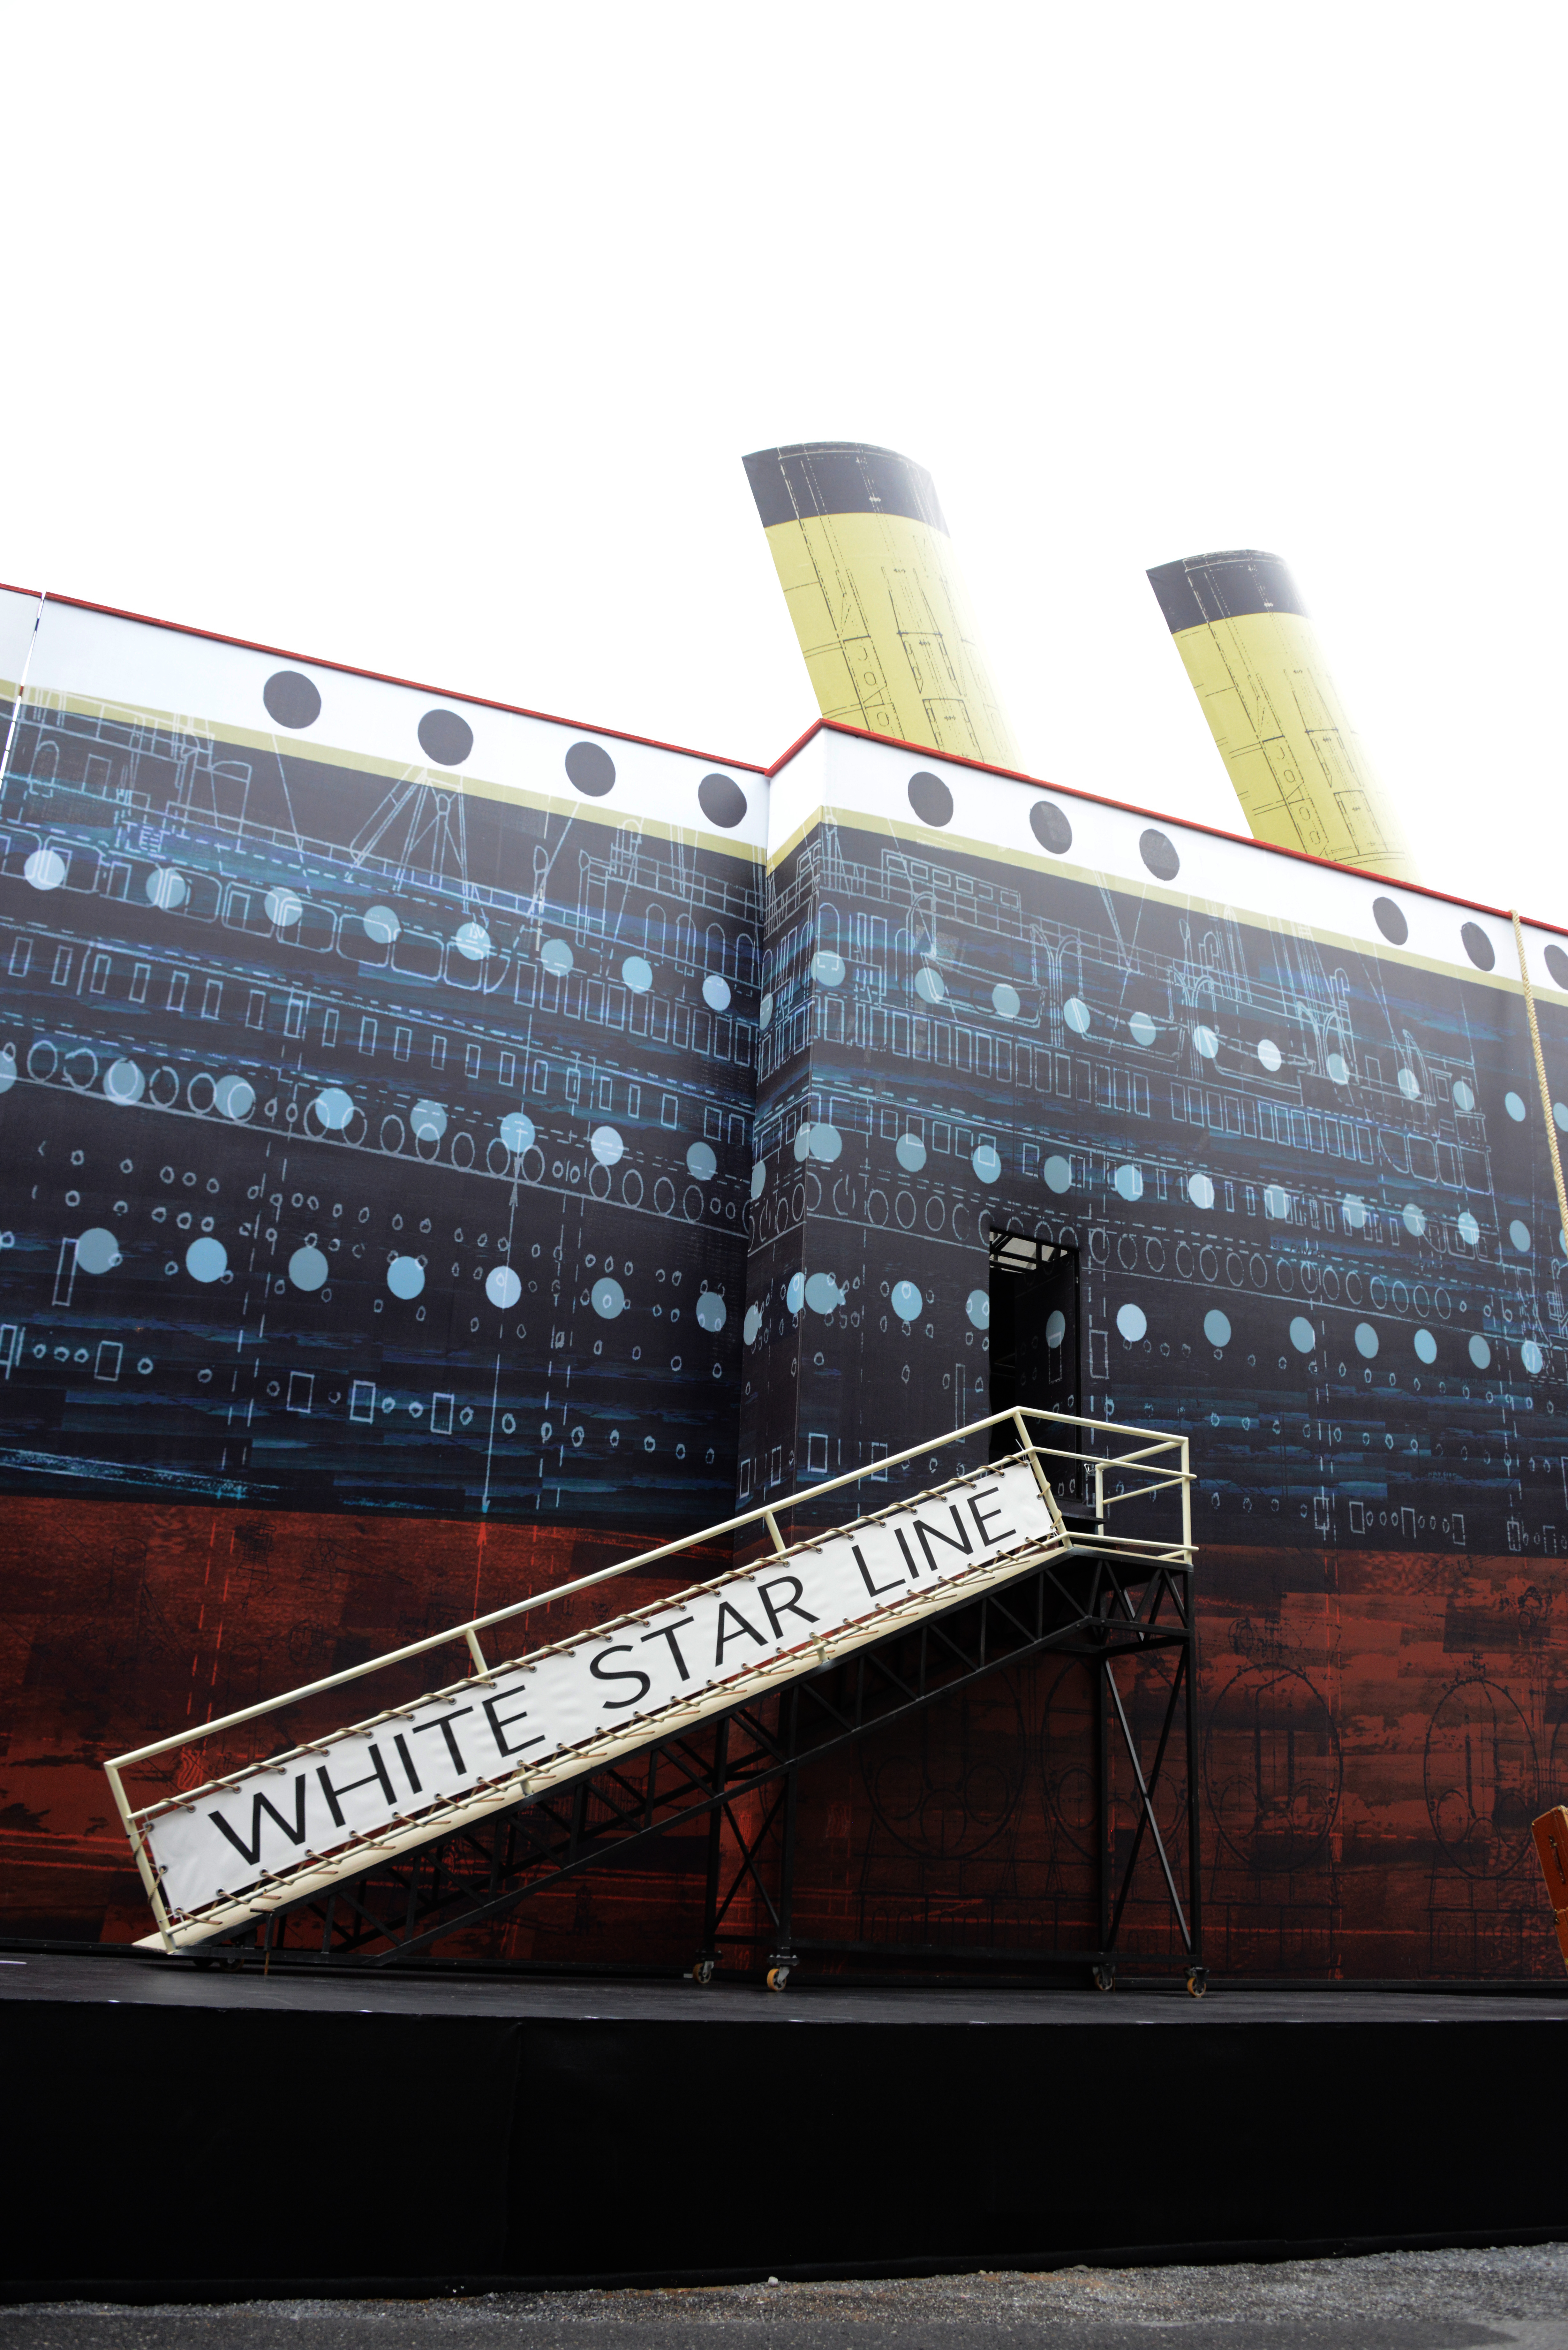 2015 titanic musical auf der walensee b hne titanic. Black Bedroom Furniture Sets. Home Design Ideas